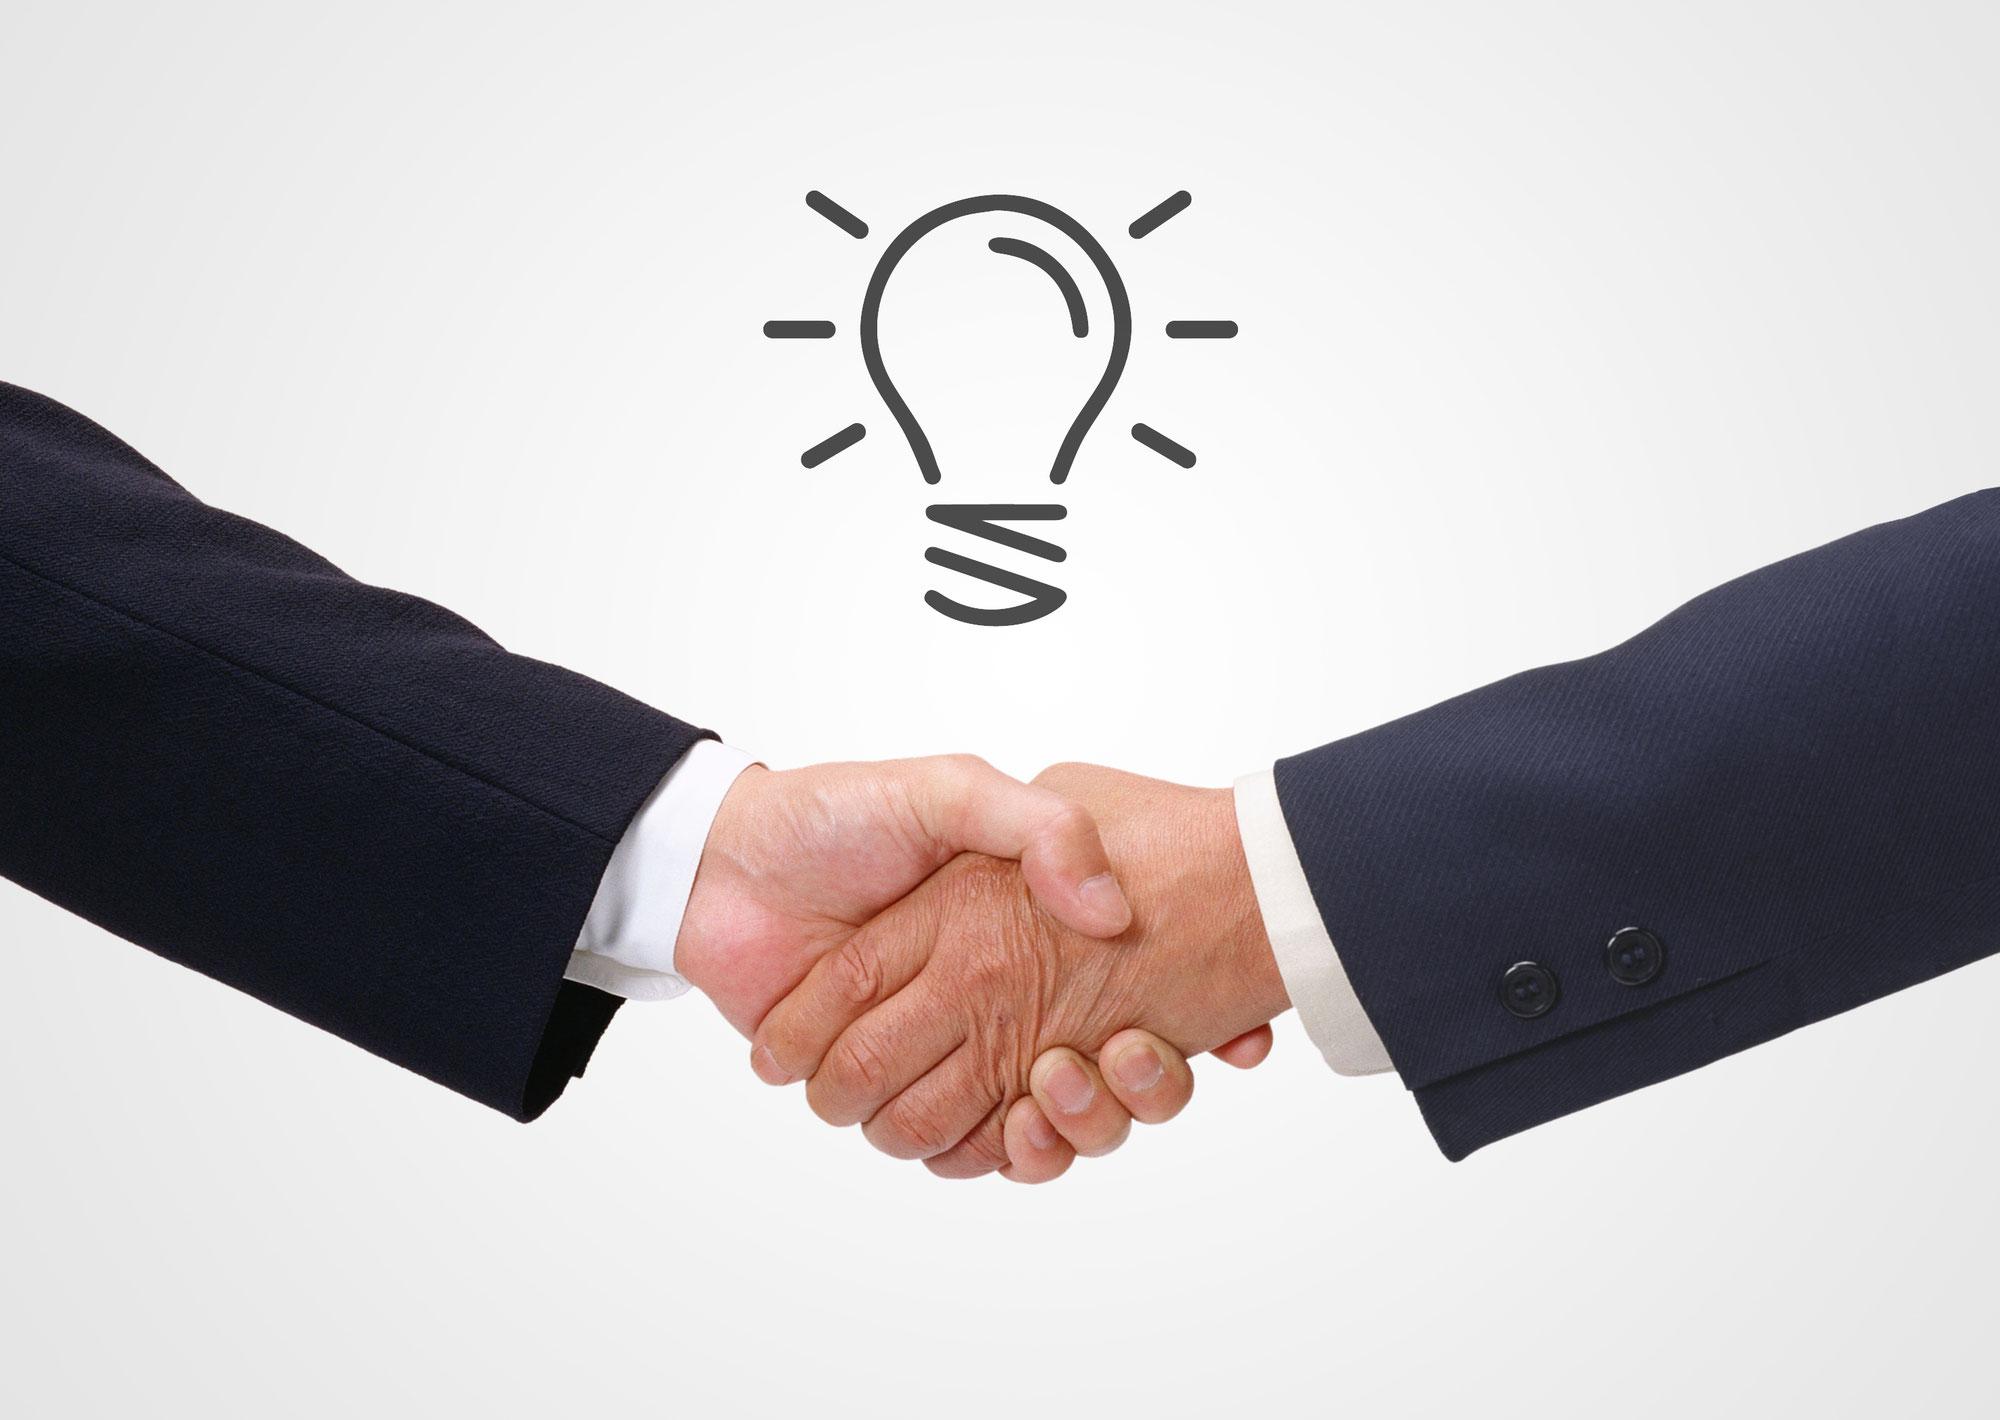 【M&Aとは?】企業の買収、合併について解説